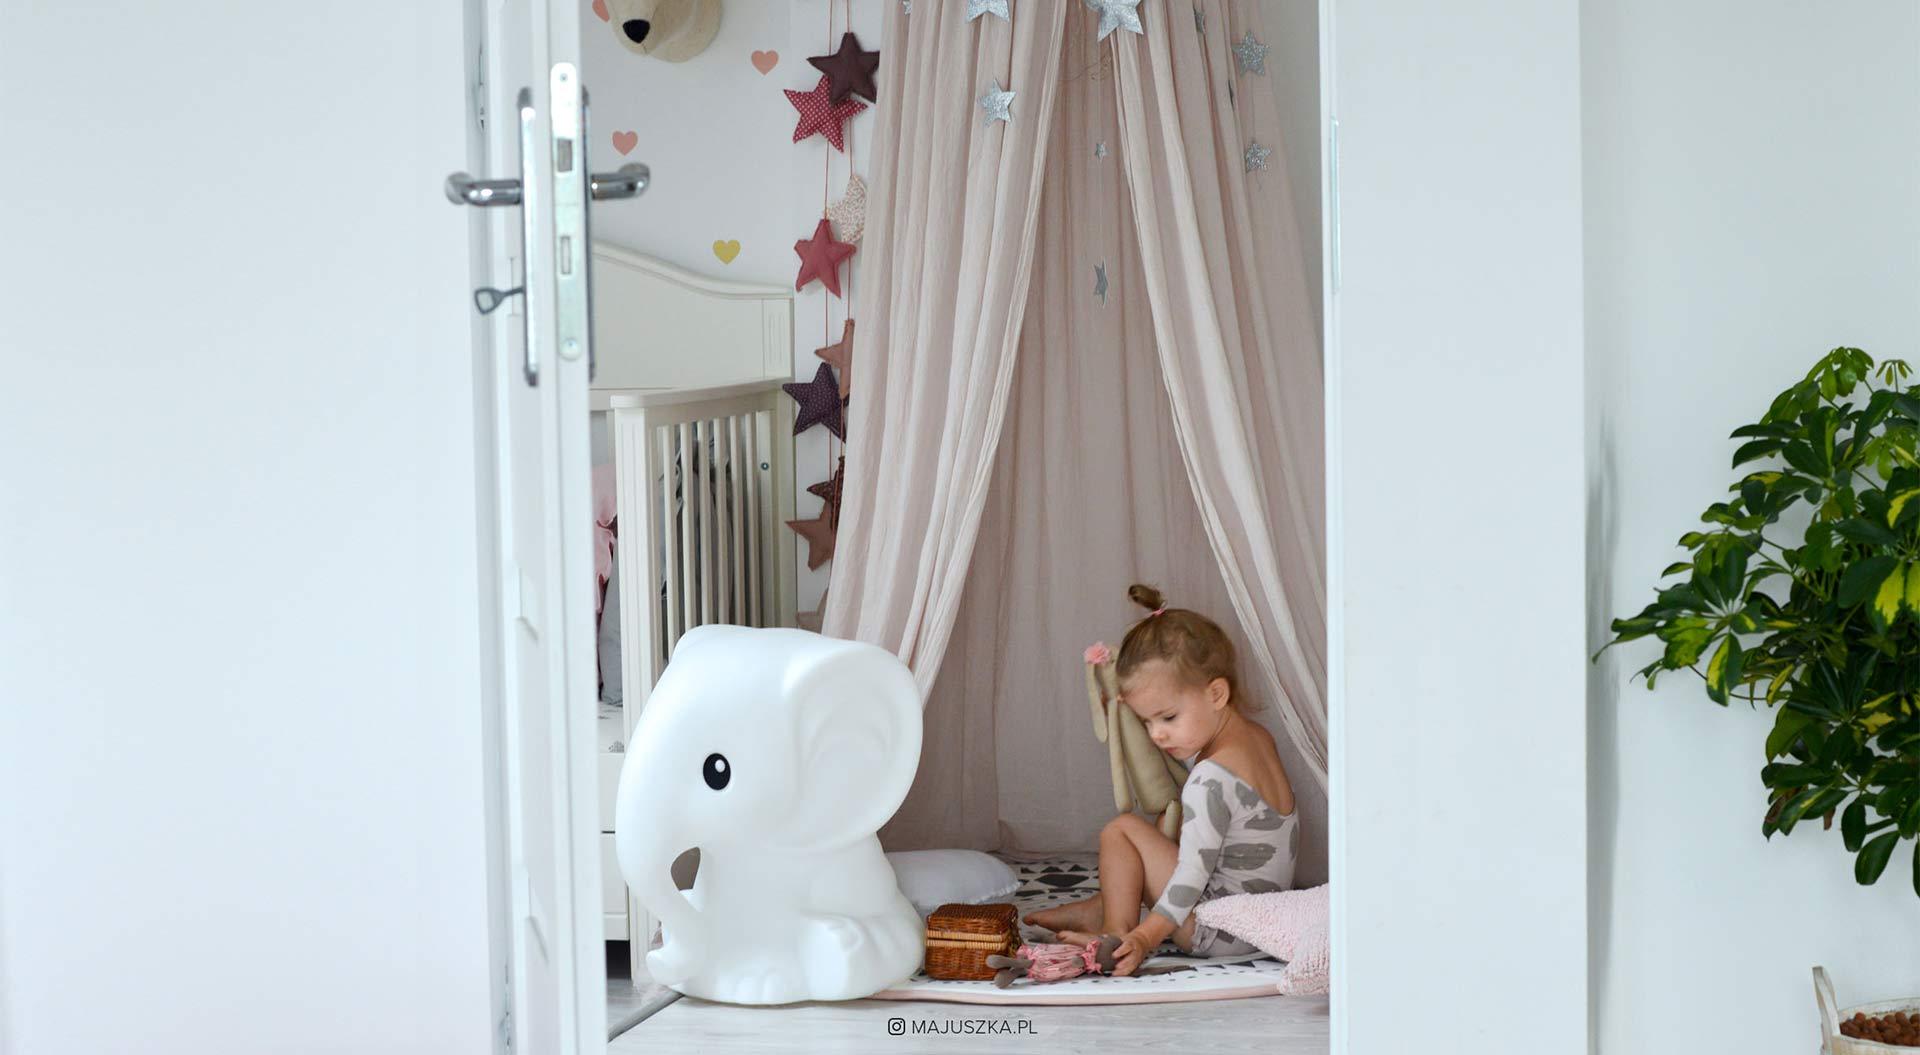 Mr Maria Miffy Lampe Und Andere Kinderlampen Kindermobel Online Mr